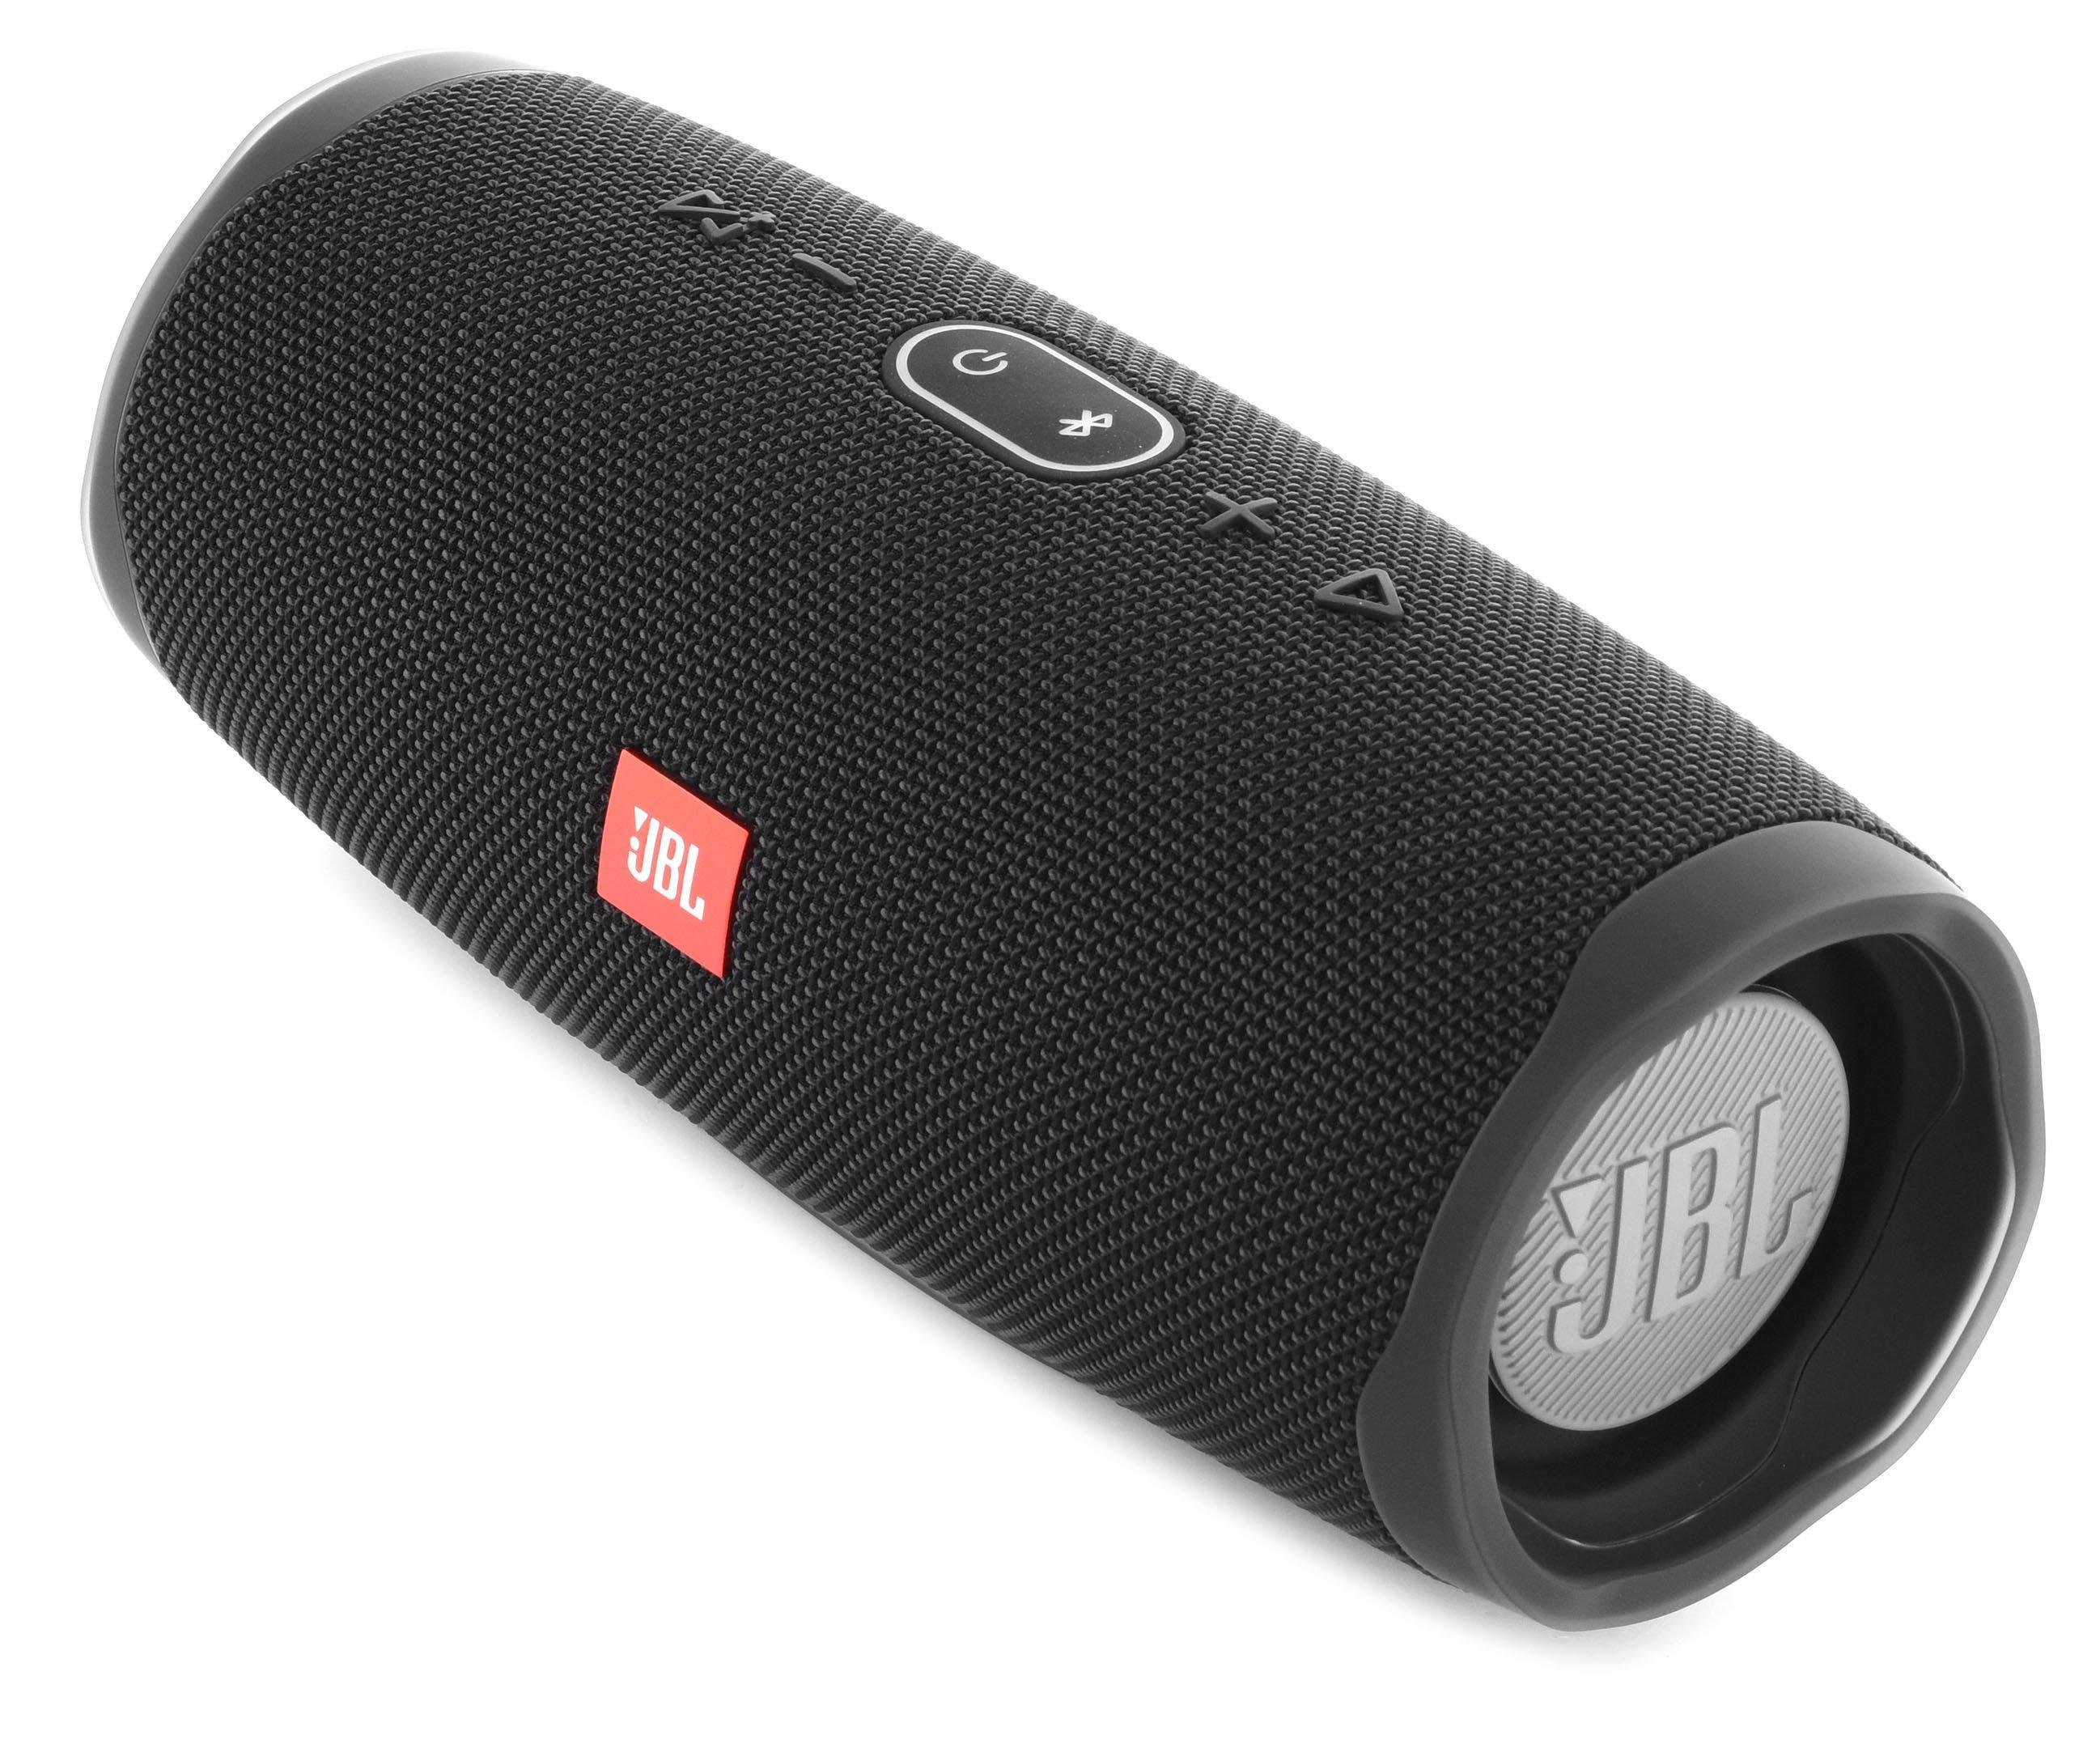 Jbl Charge 4 Portable Wireless Bluetooth Speaker Black Price In Saudi Arabia Extra Stores Saudi Arabia Kanbkam